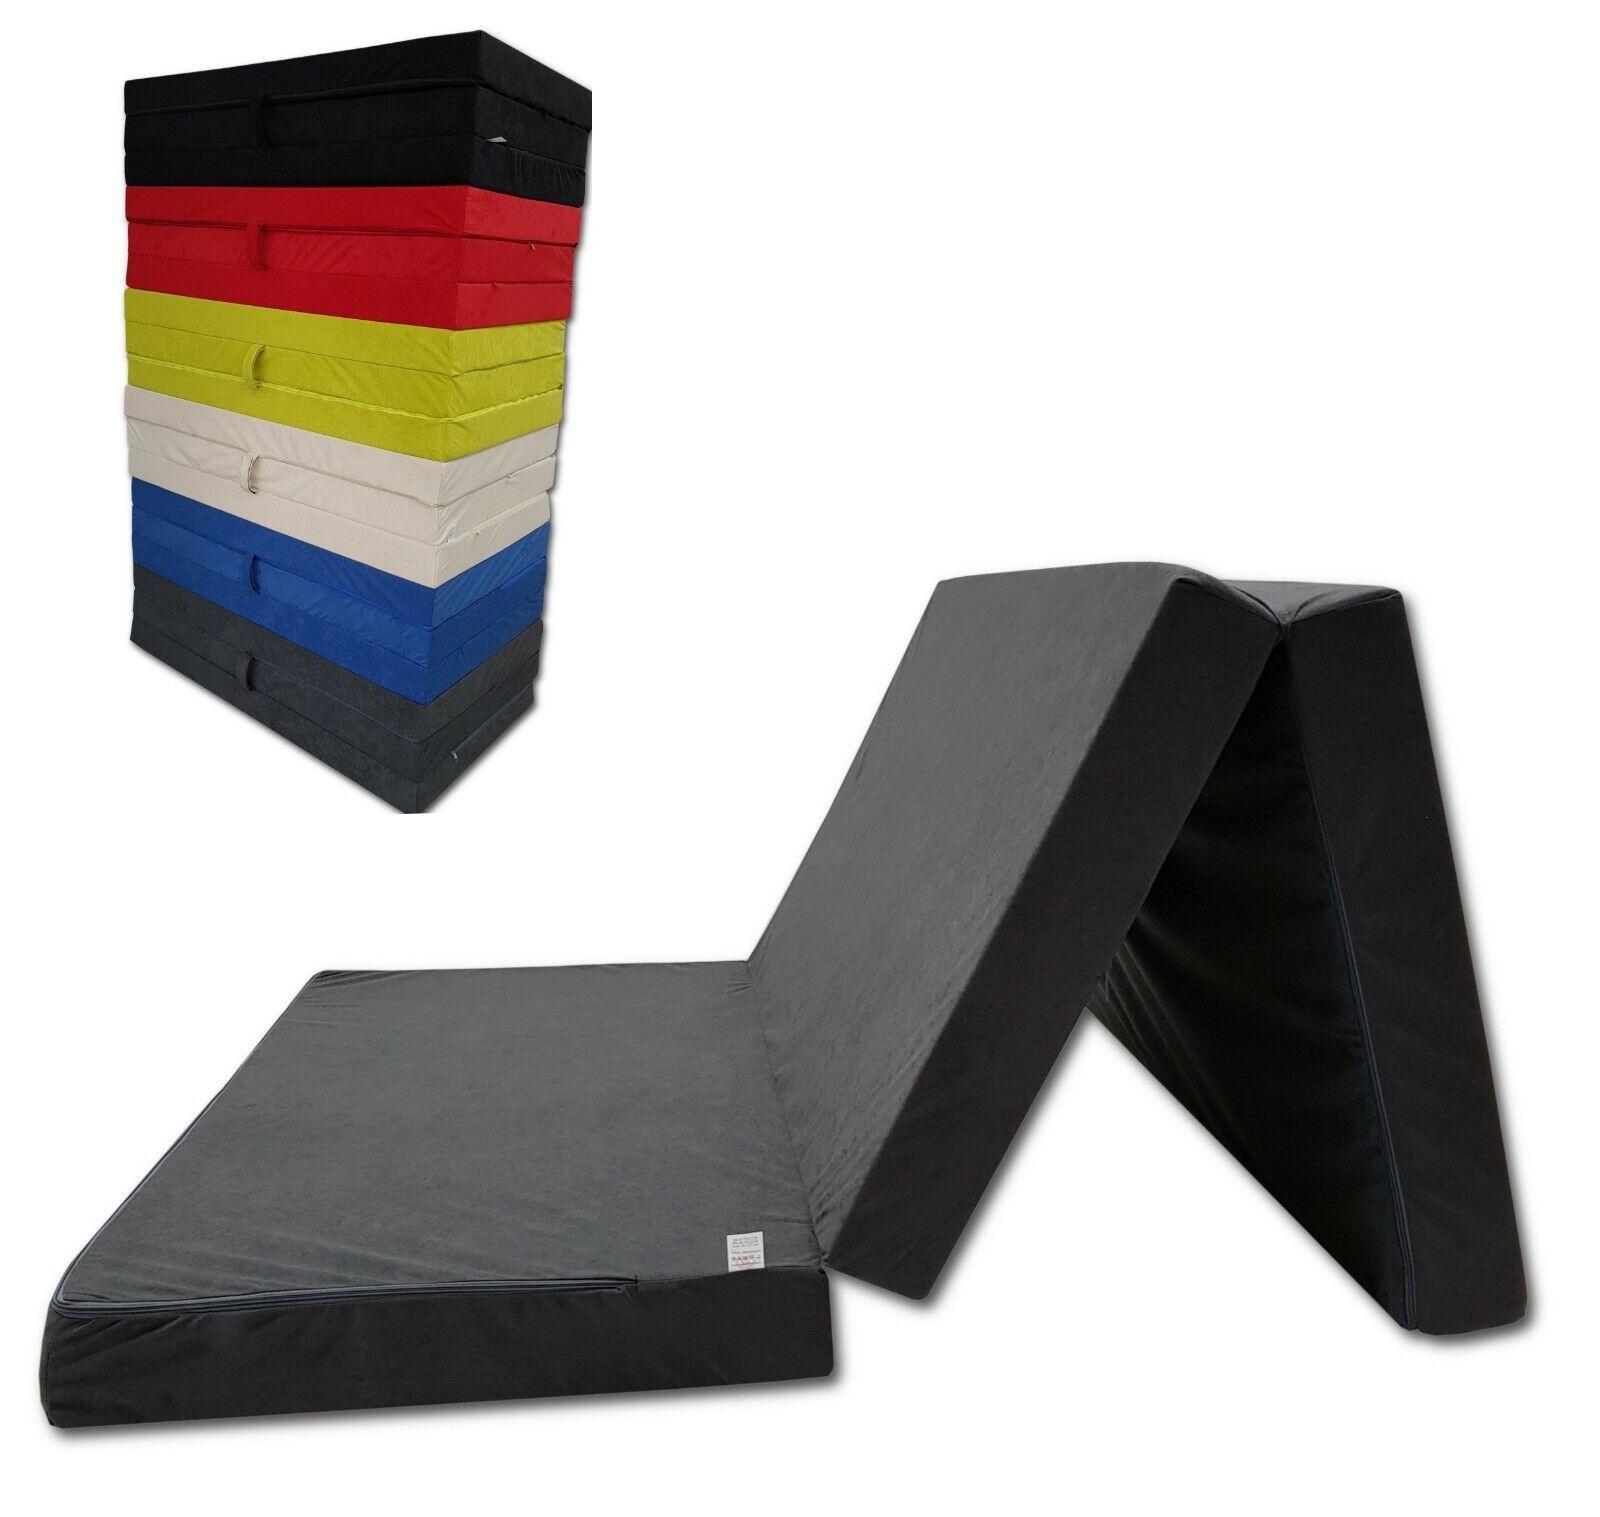 - 4 Inches TriFold/Tri Folding Foam Bed/Floor Foam/Ottoman/Mattress